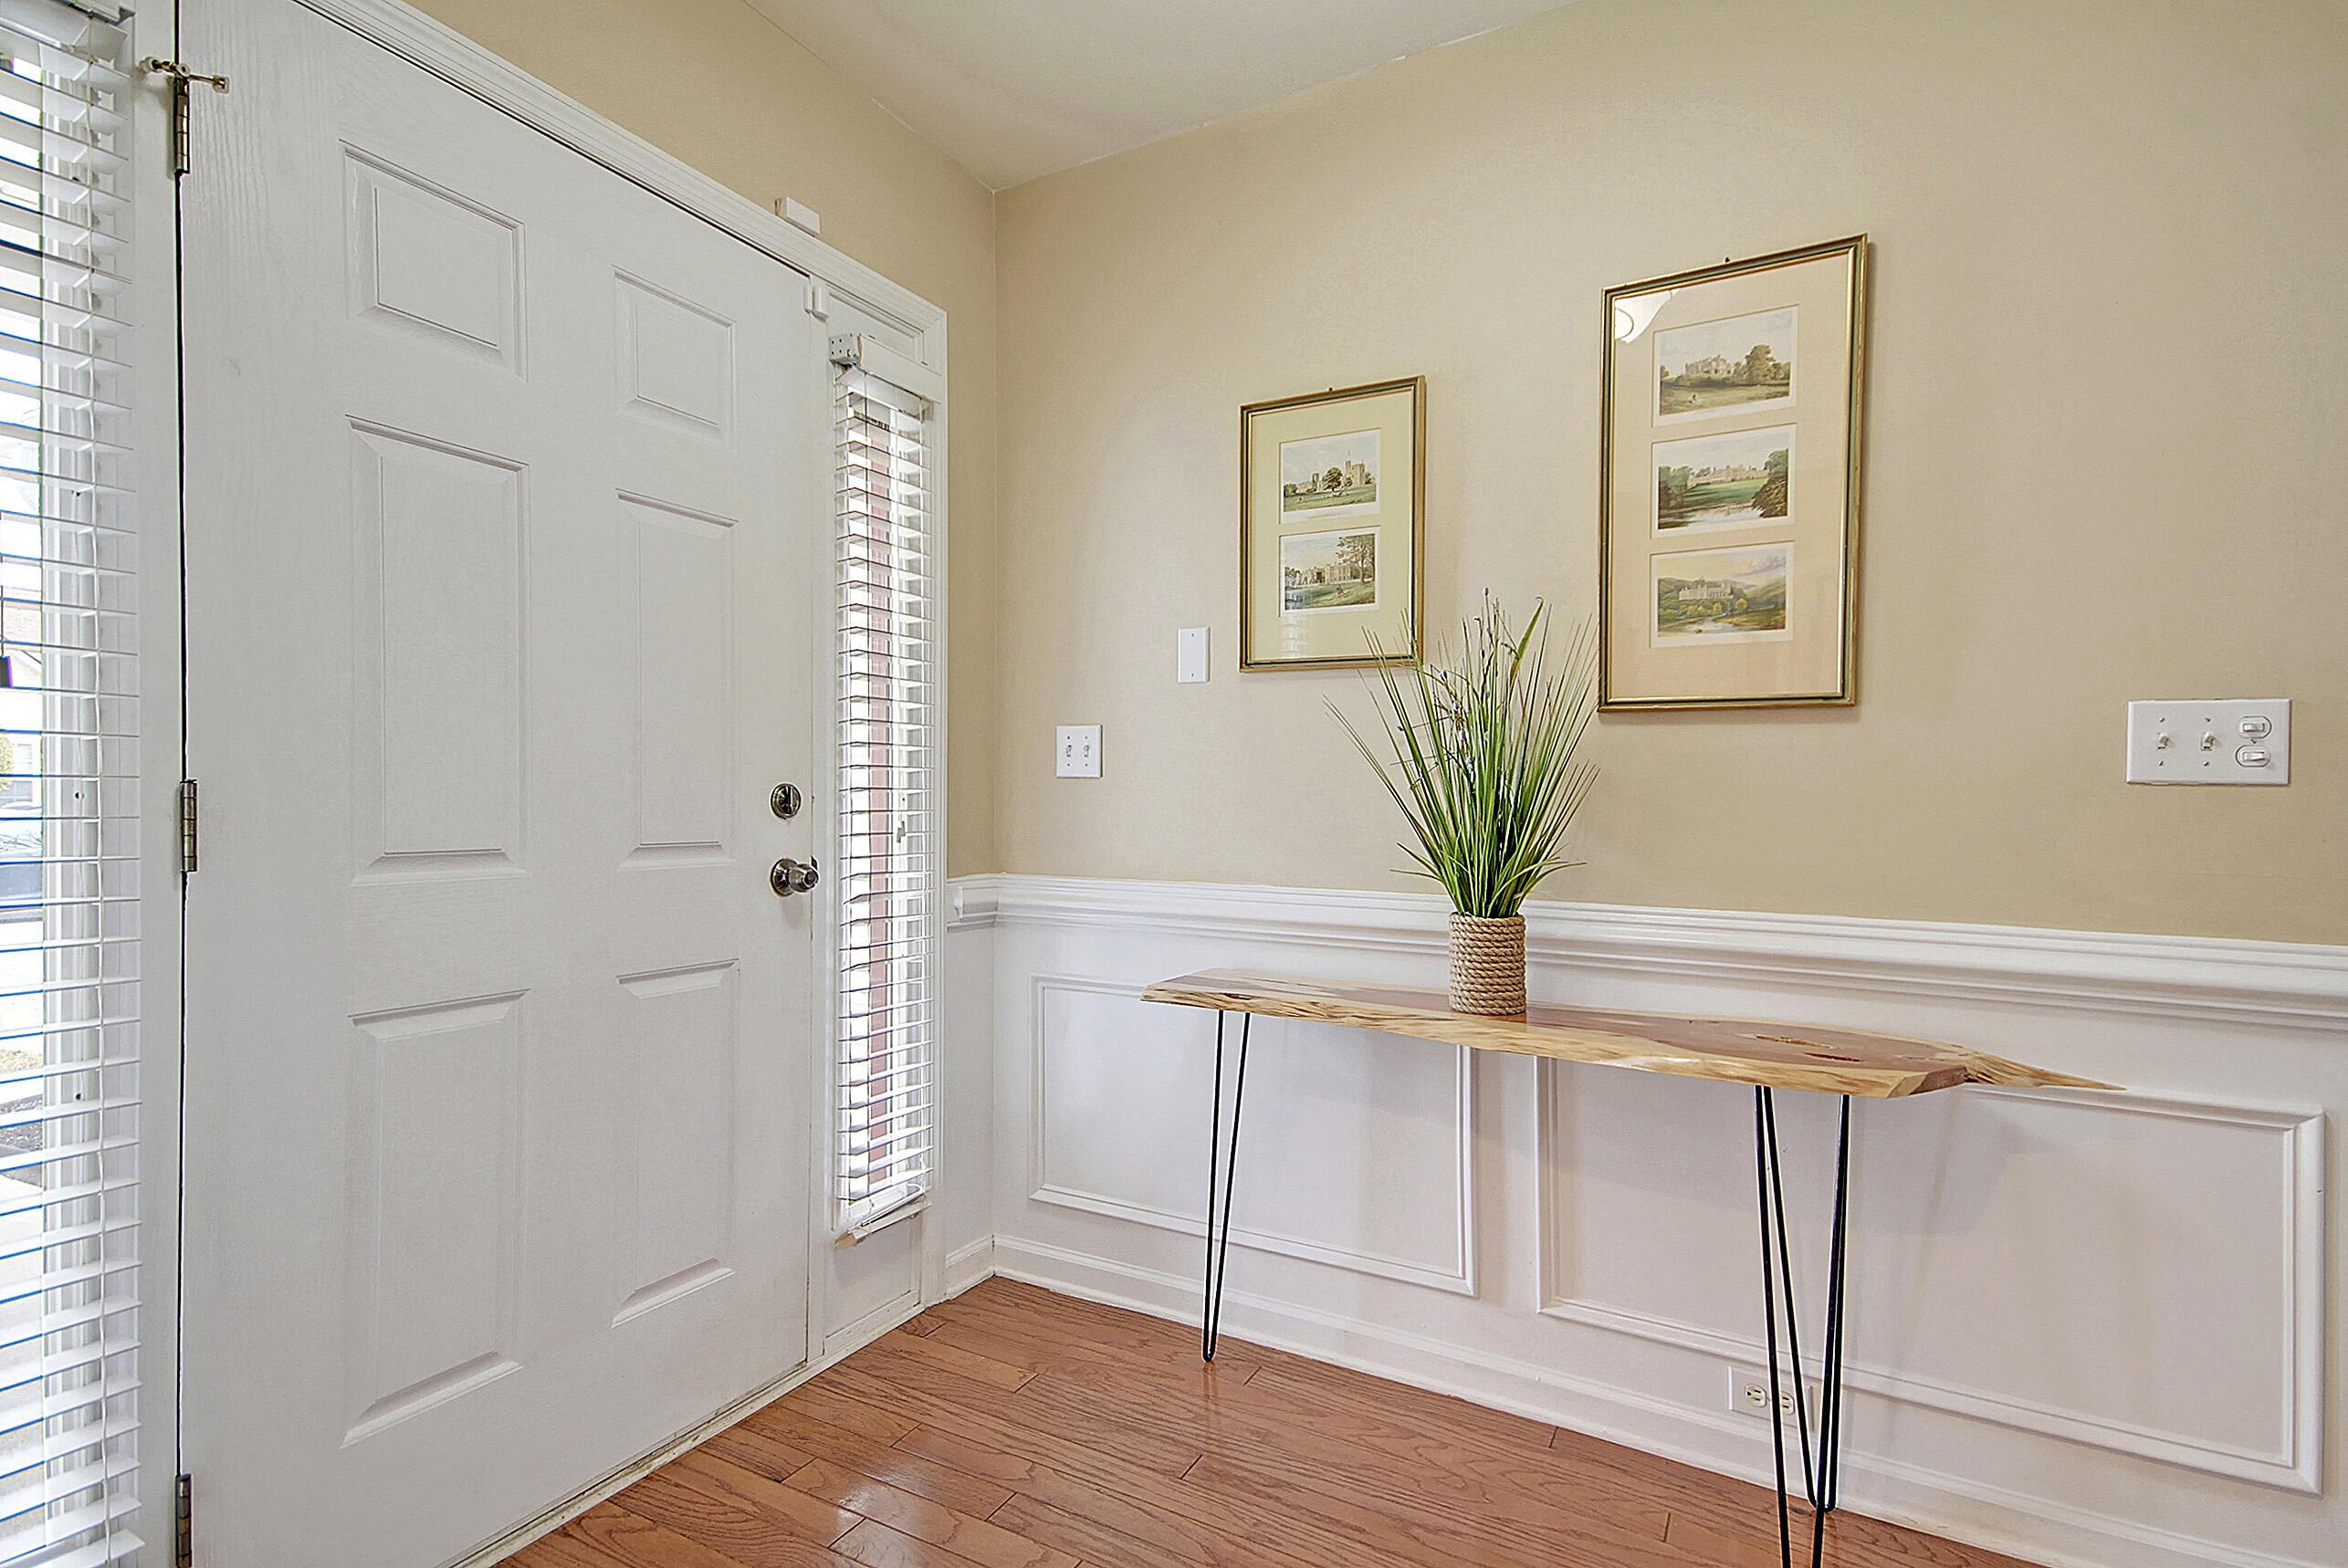 Park West Homes For Sale - 1460 Wellesley, Mount Pleasant, SC - 6